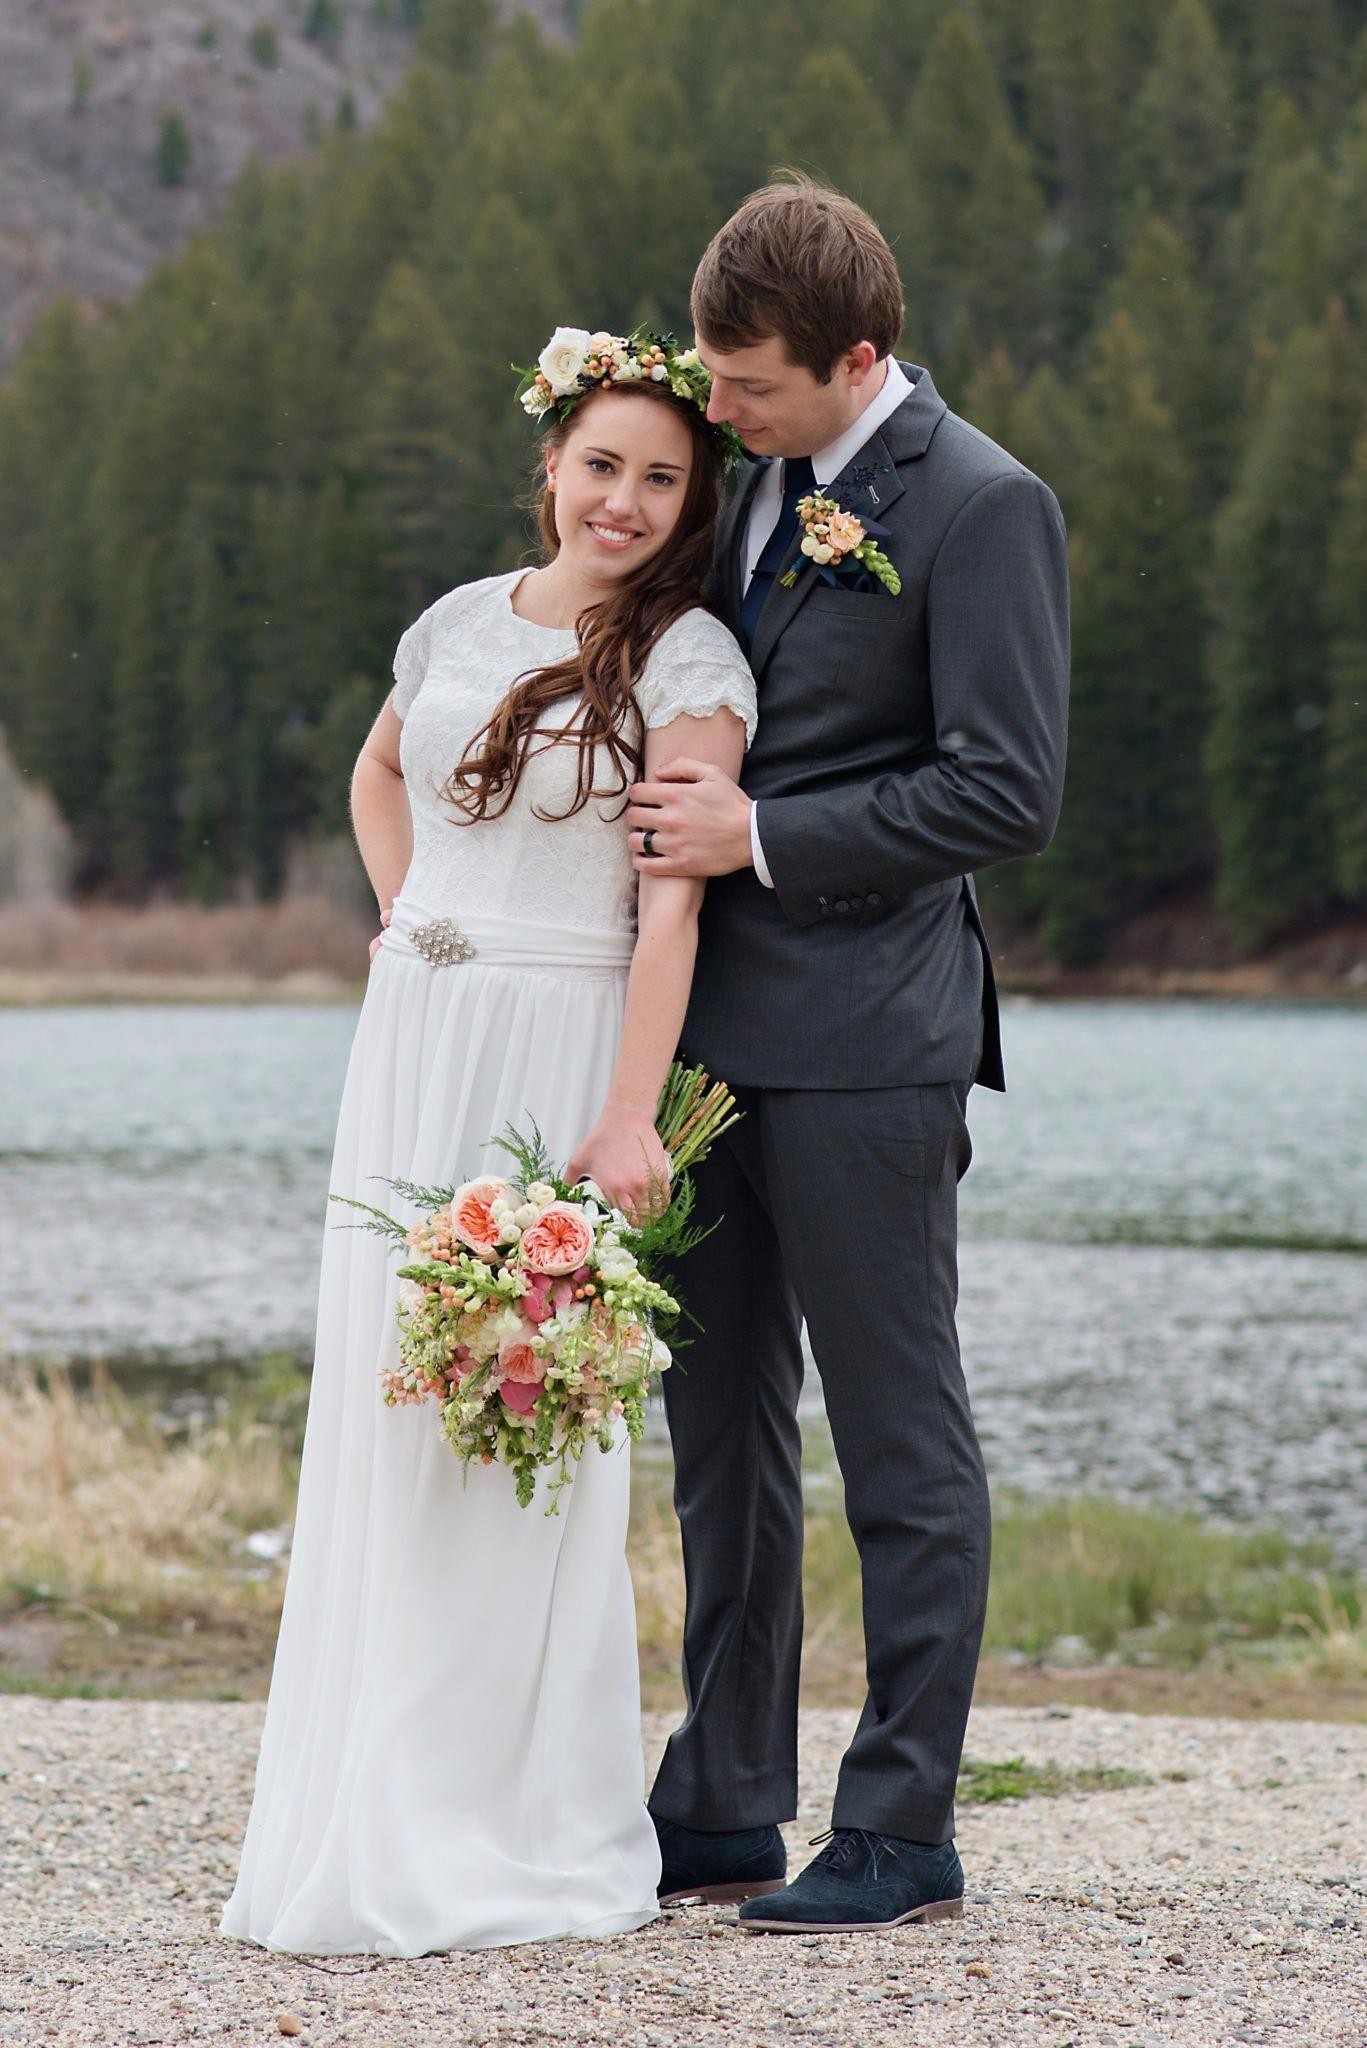 Stunning.. pic beautyblackandwhitecouplesphotos Wedding